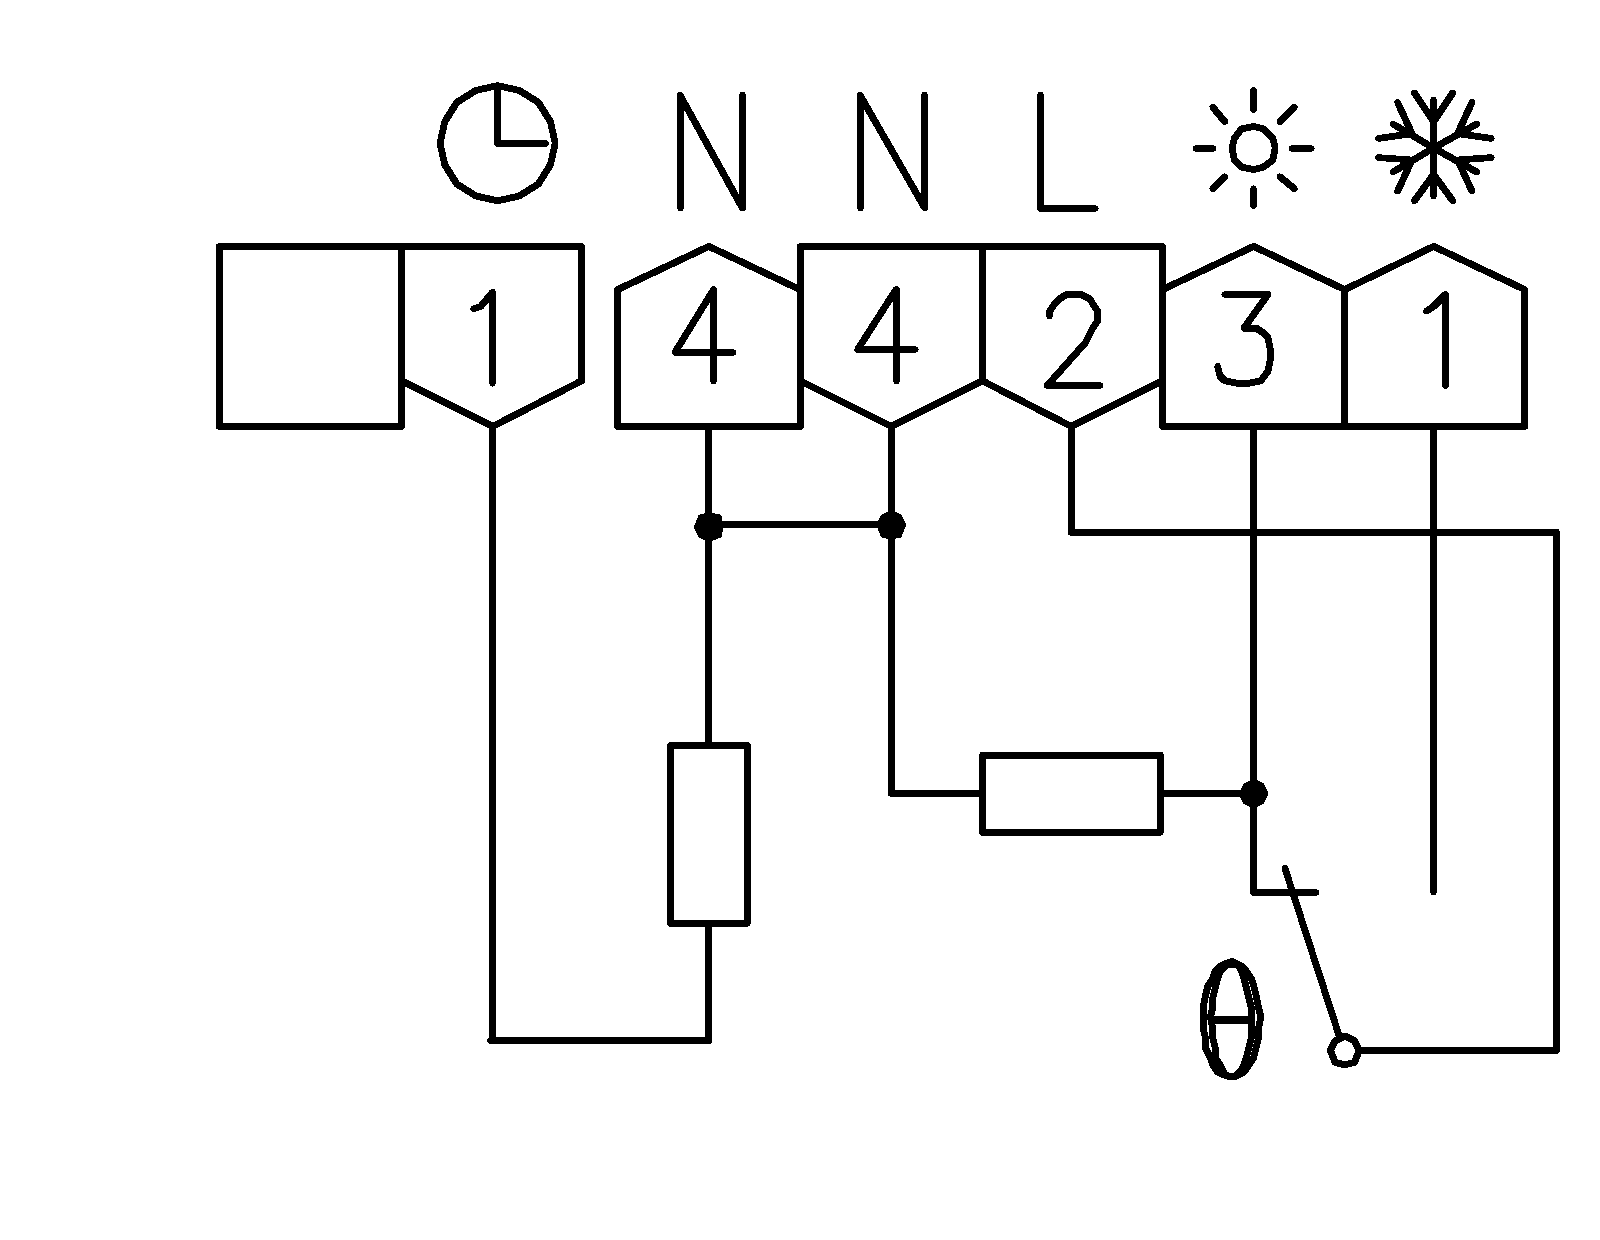 MA012100 Circuit diagram